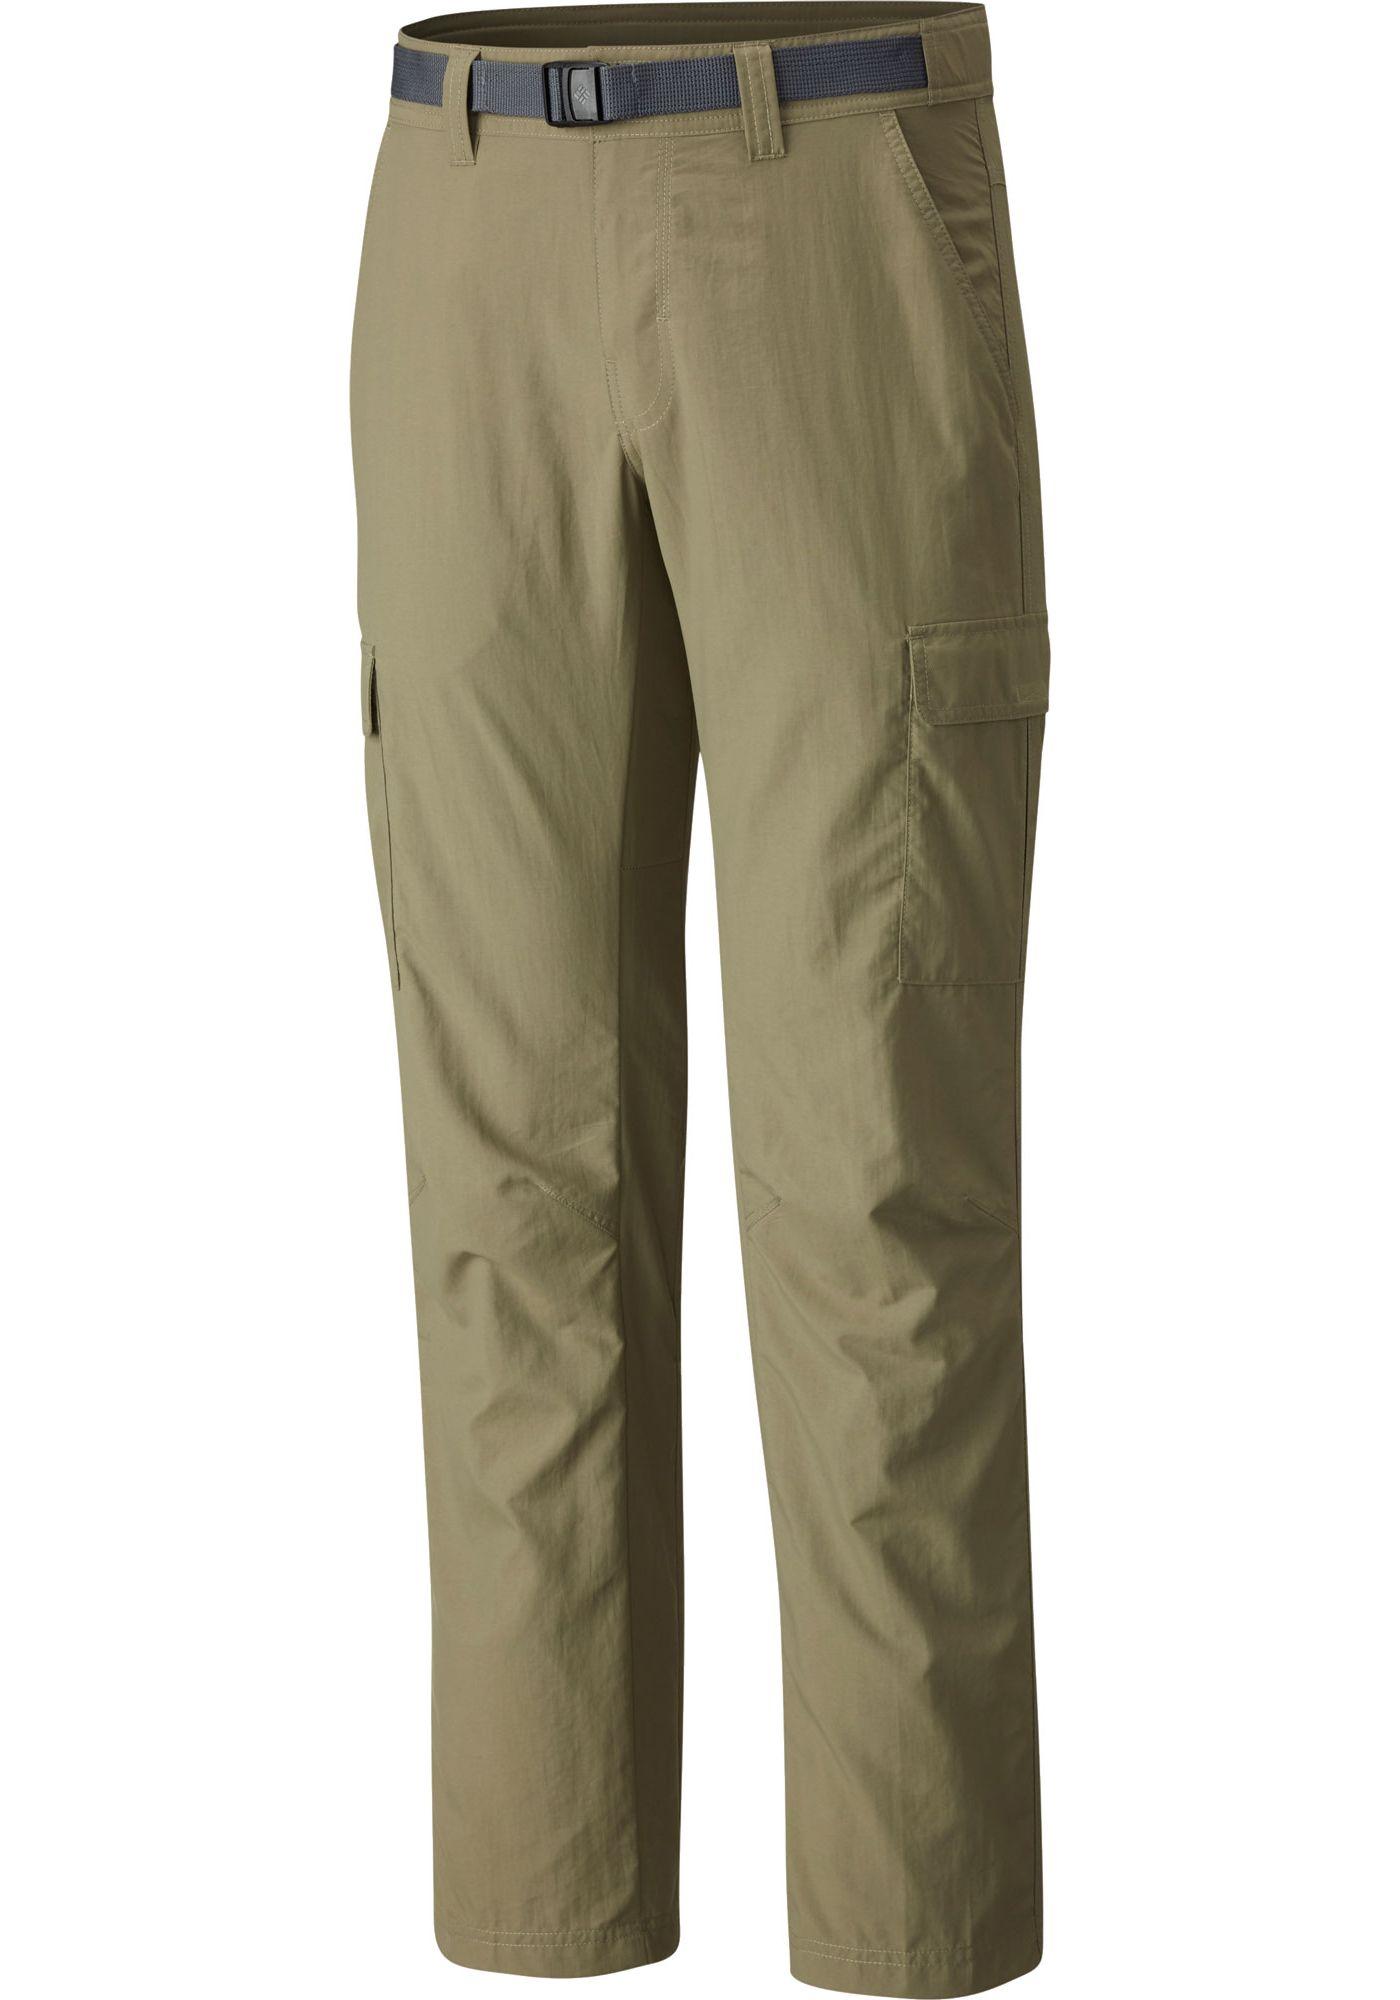 Columbia Men's Cascades Explorer Pants